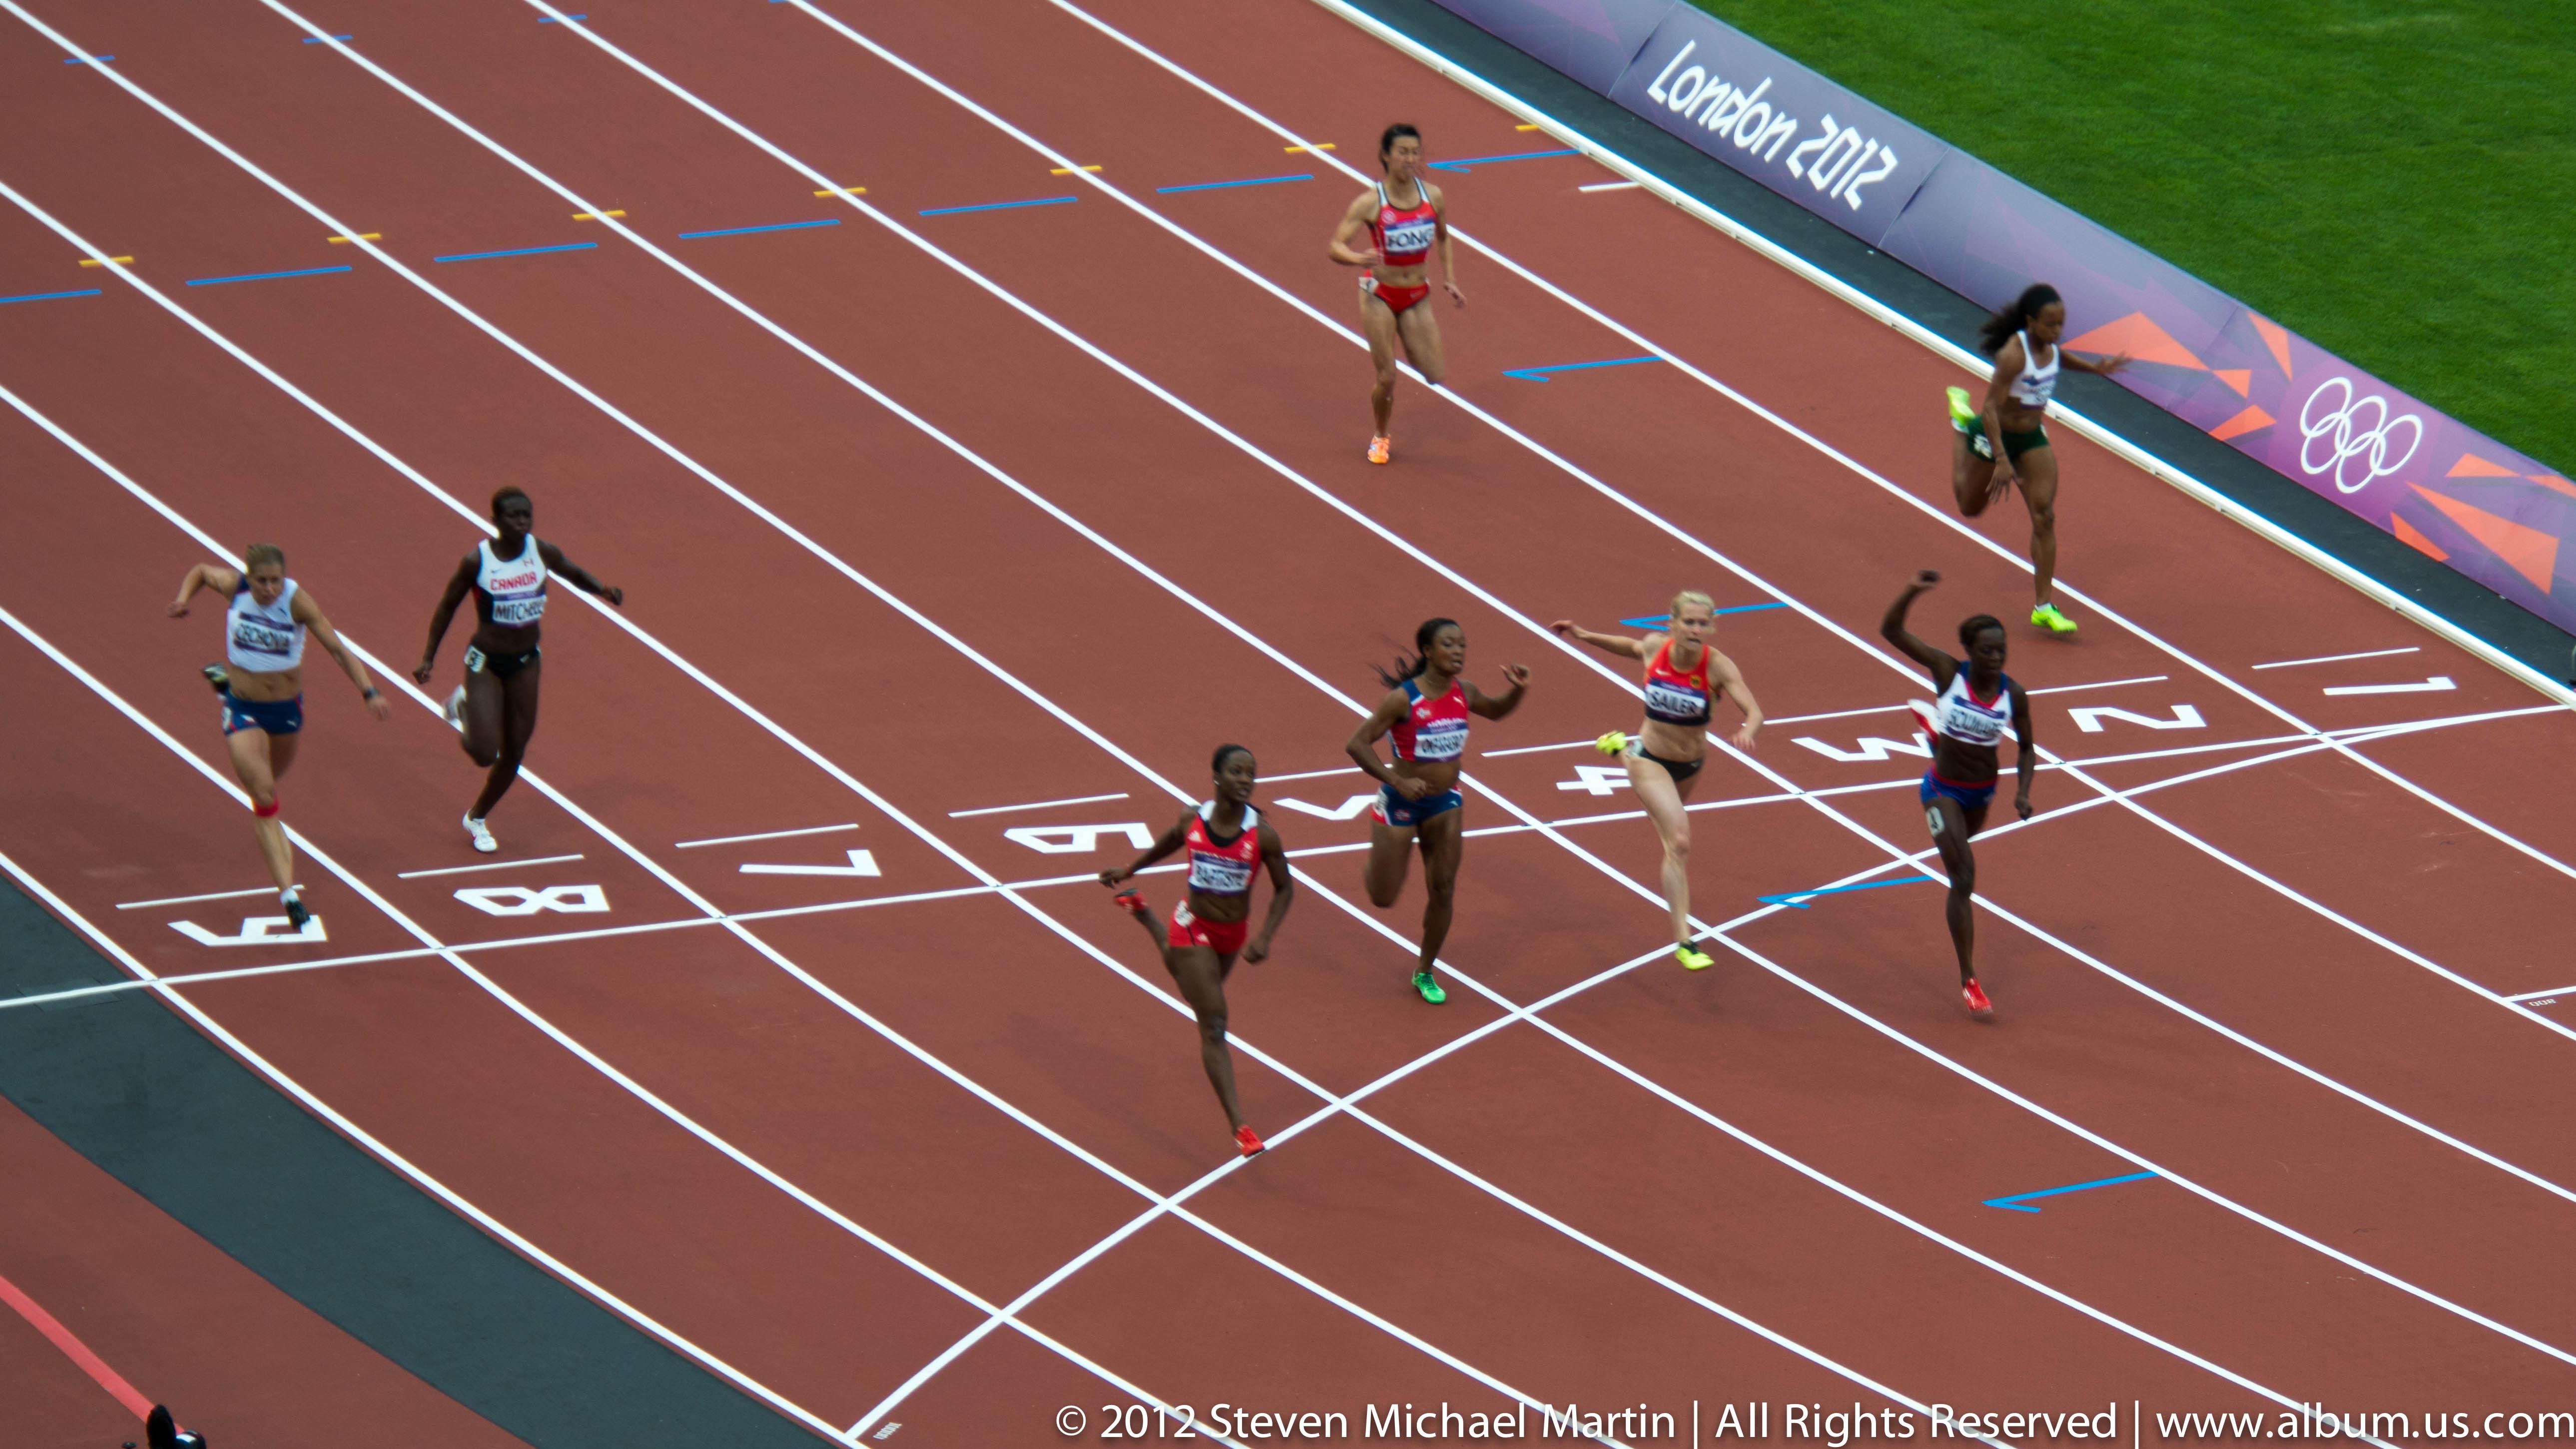 SMartin_2012 Olympics Athletics_20120803_008